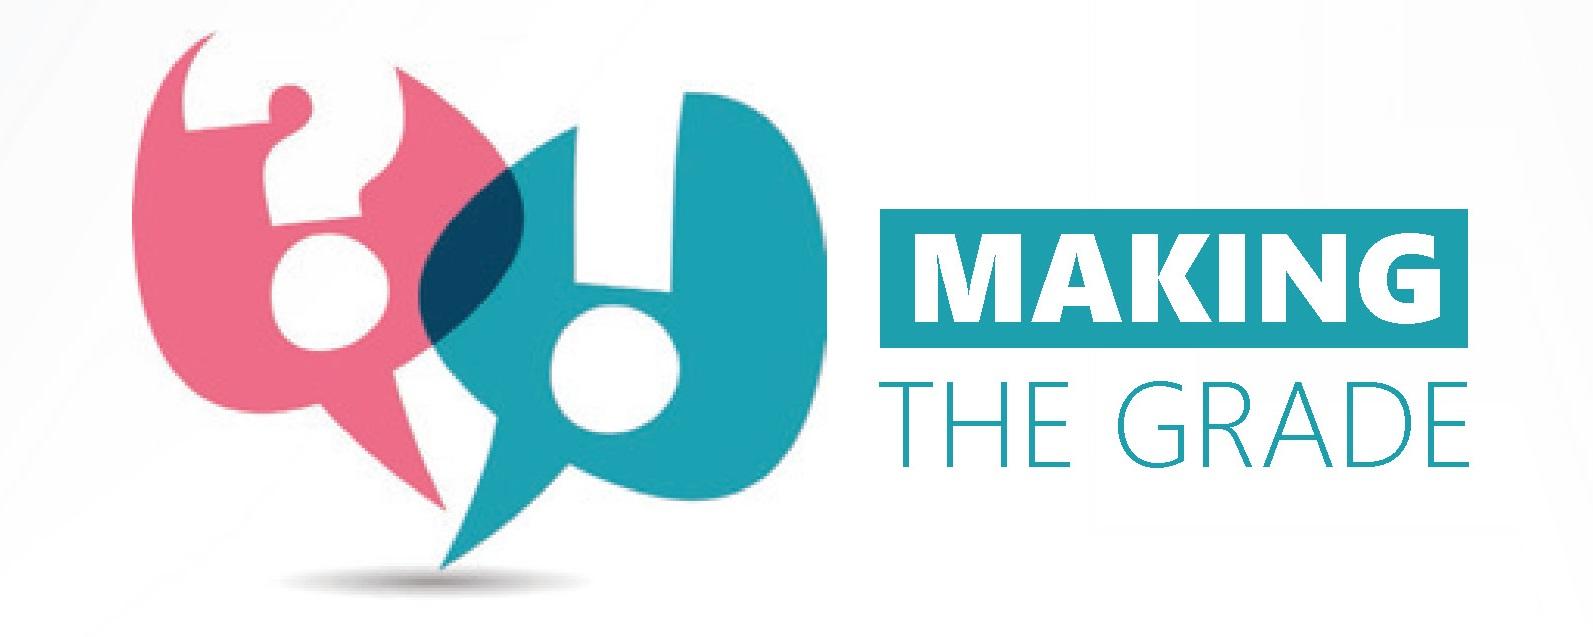 MtG logo hispanic outlook-12 jobs